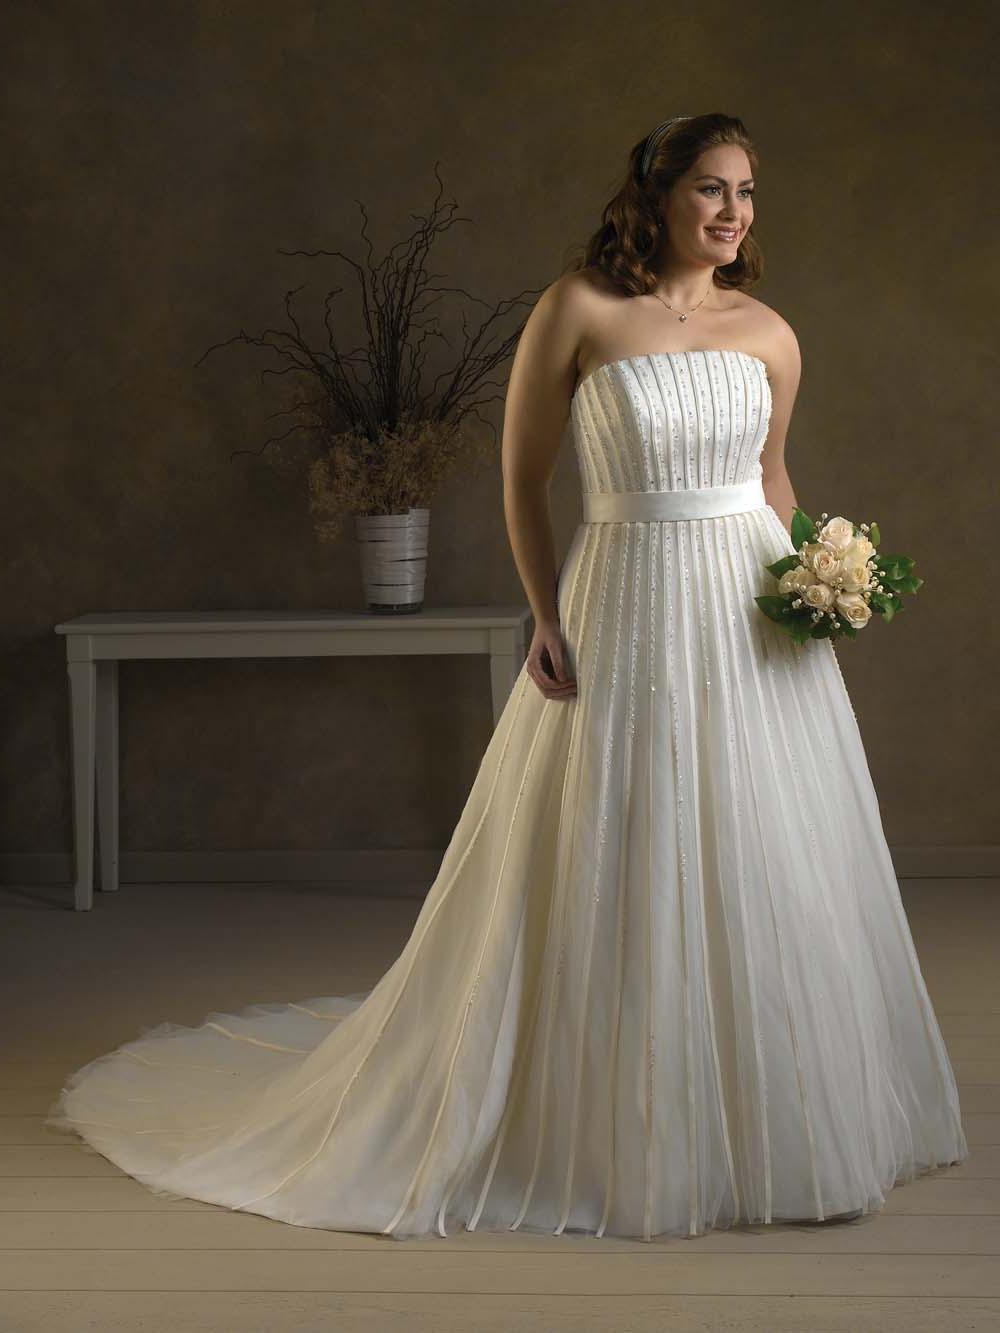 New style plus size wedding